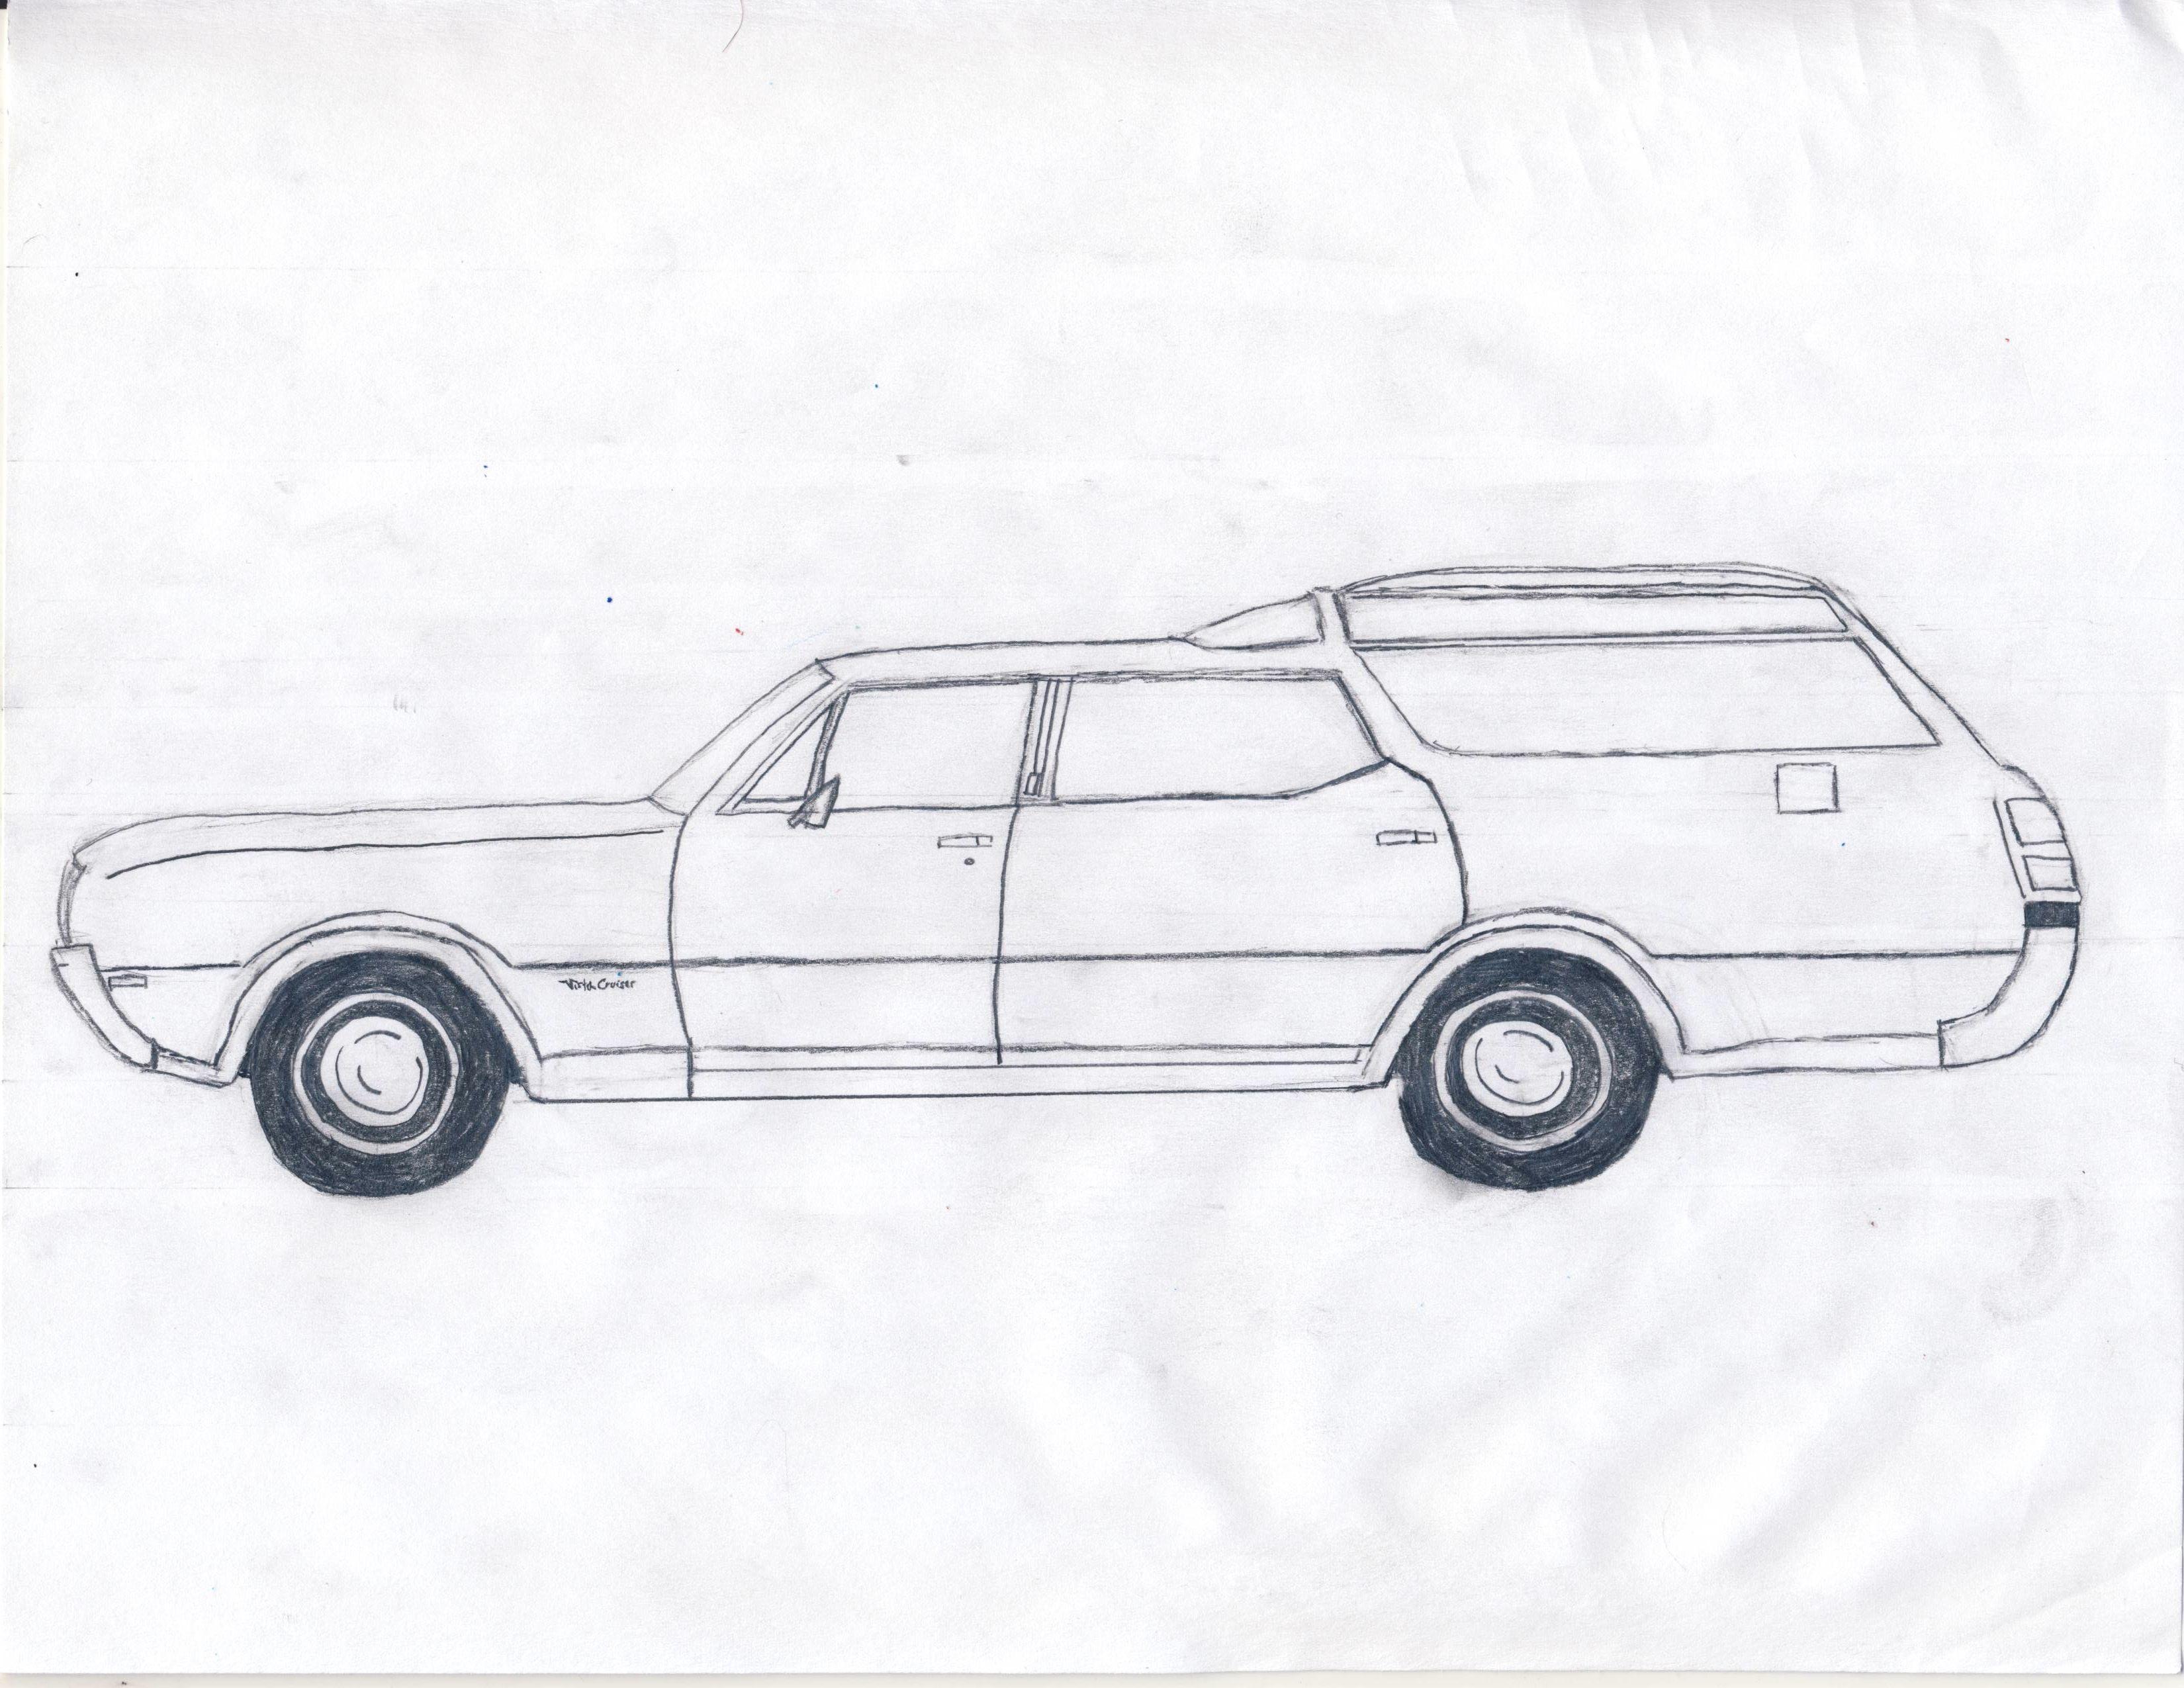 Pin By Bailey Anderson On Tatttoooos Car Silhouette Vista Cruiser 70s Cars